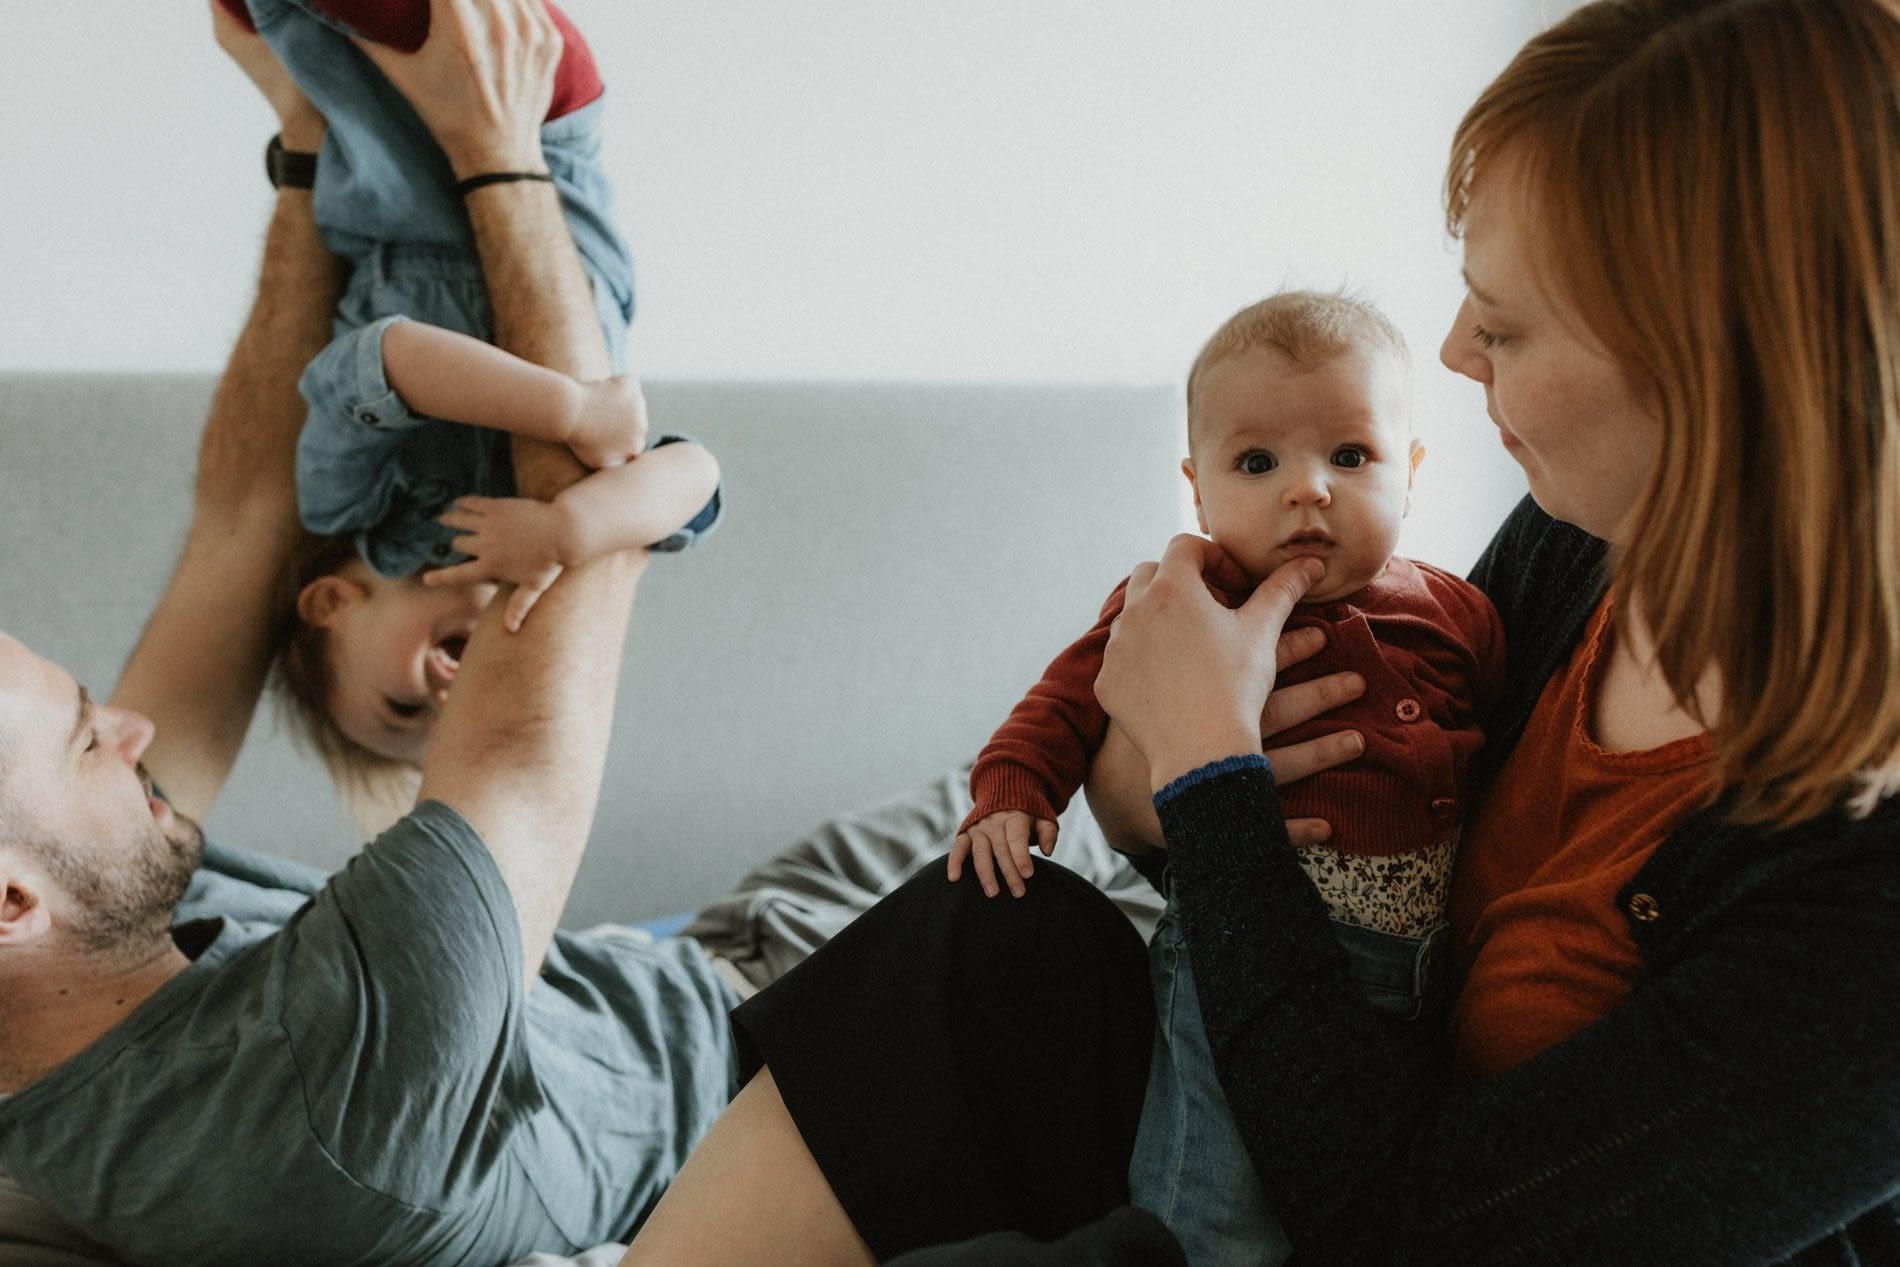 Gezinsfotografie van Annen spontane gezinsfoto's, documentaire fotoshoot, gezinsportret, gezinsfotografie, spontane familiefoto's